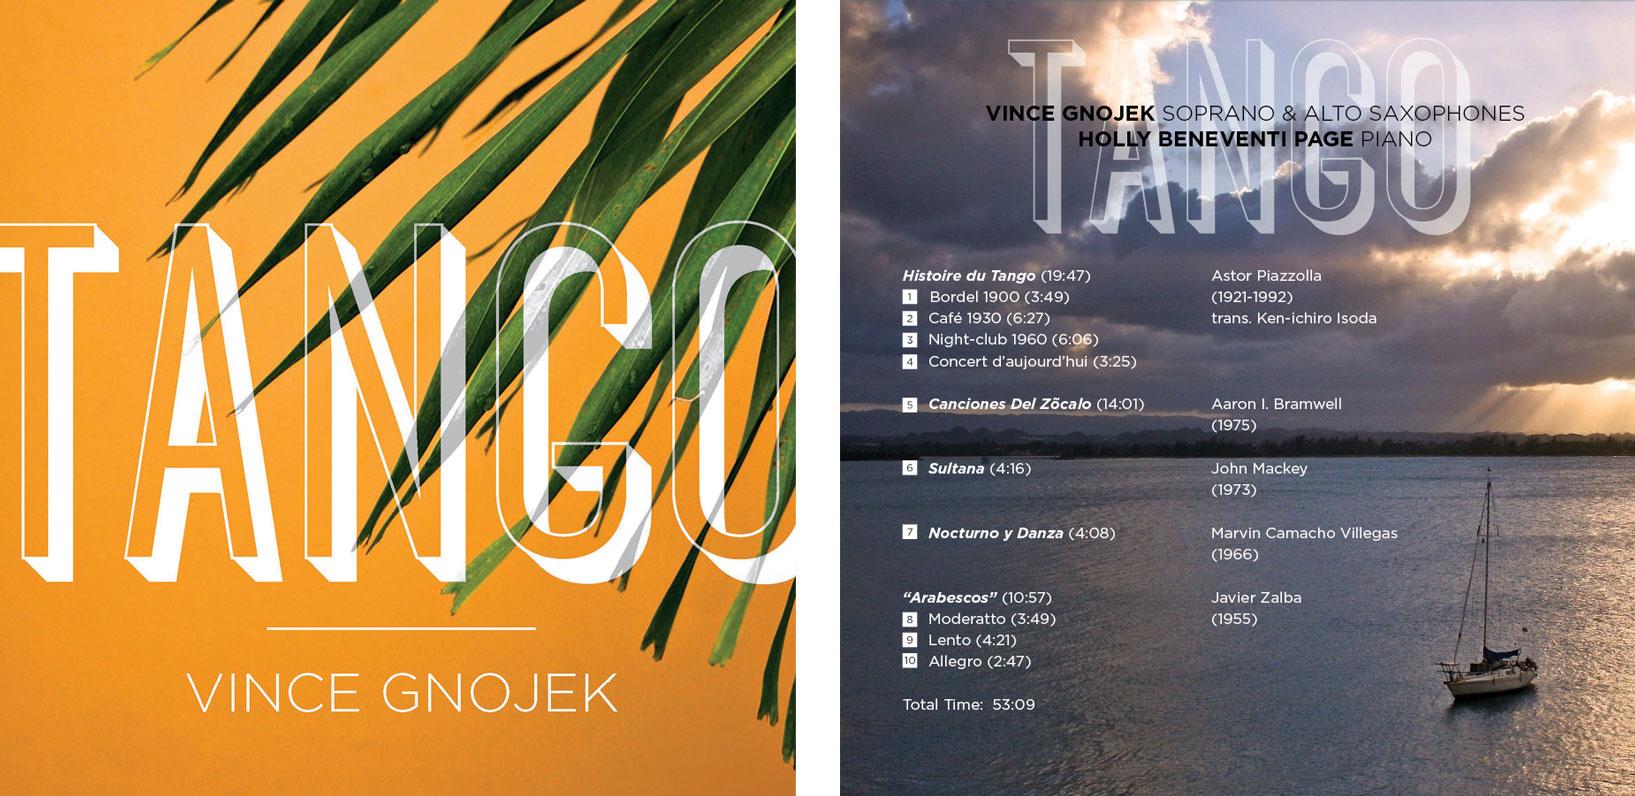 Vince Gnojek - Tango album cover